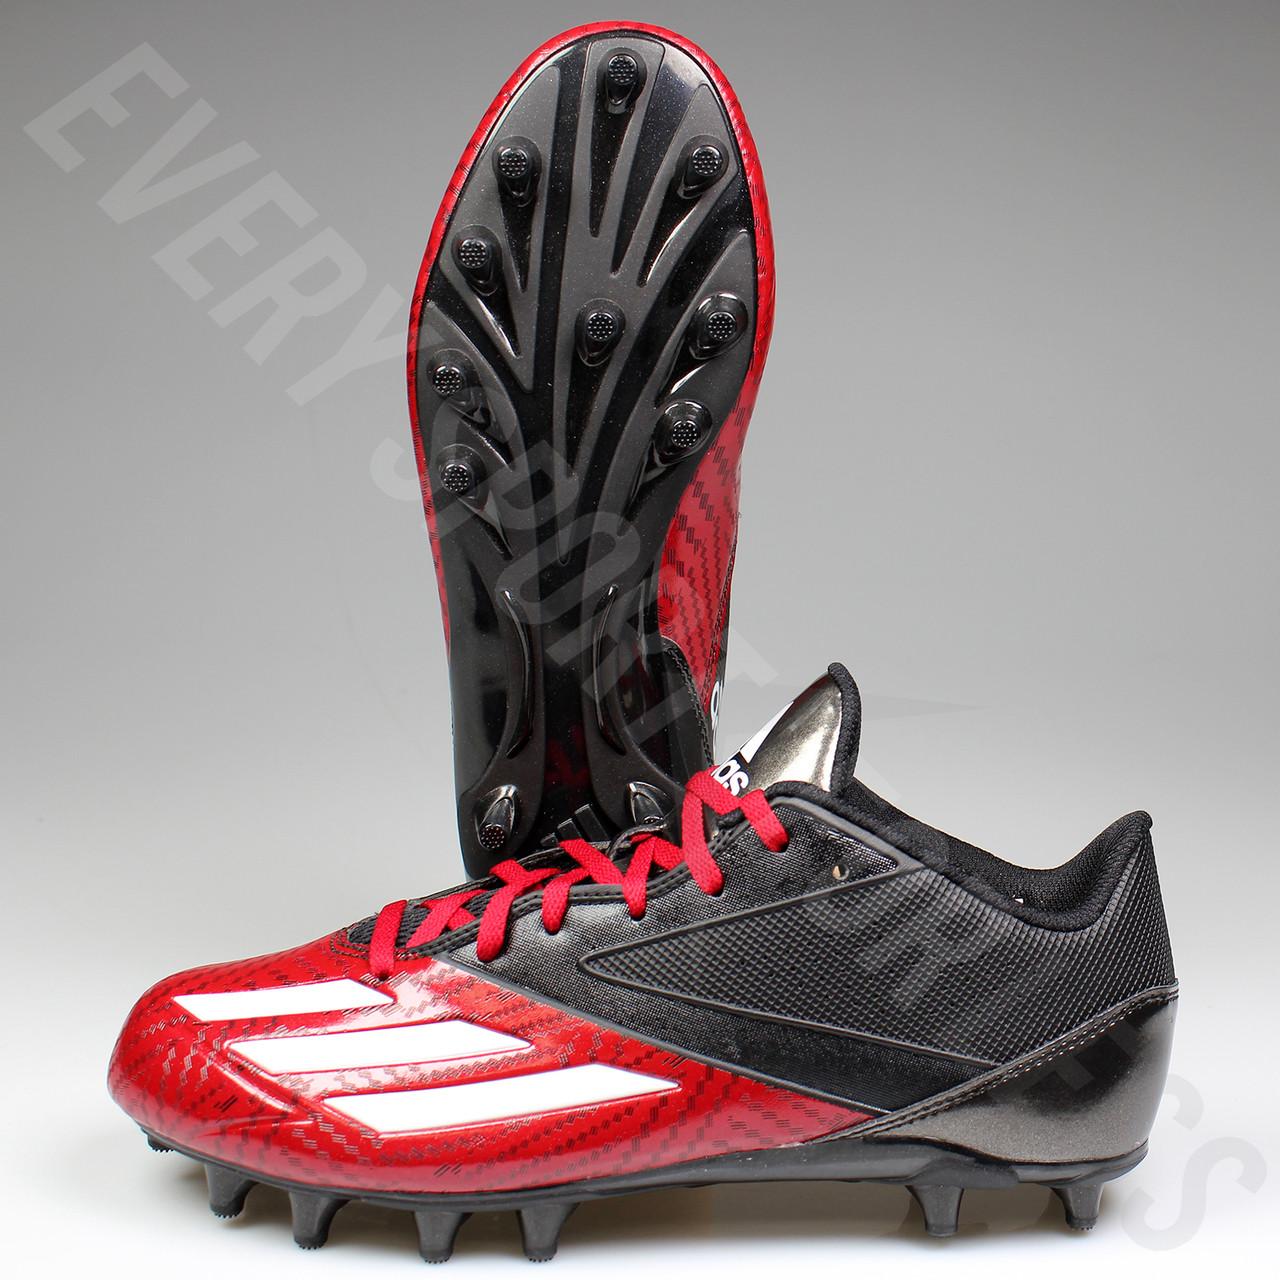 Adidas Adizero 5 Star Low Football Lacrosse Cleats D70176 Black, Red